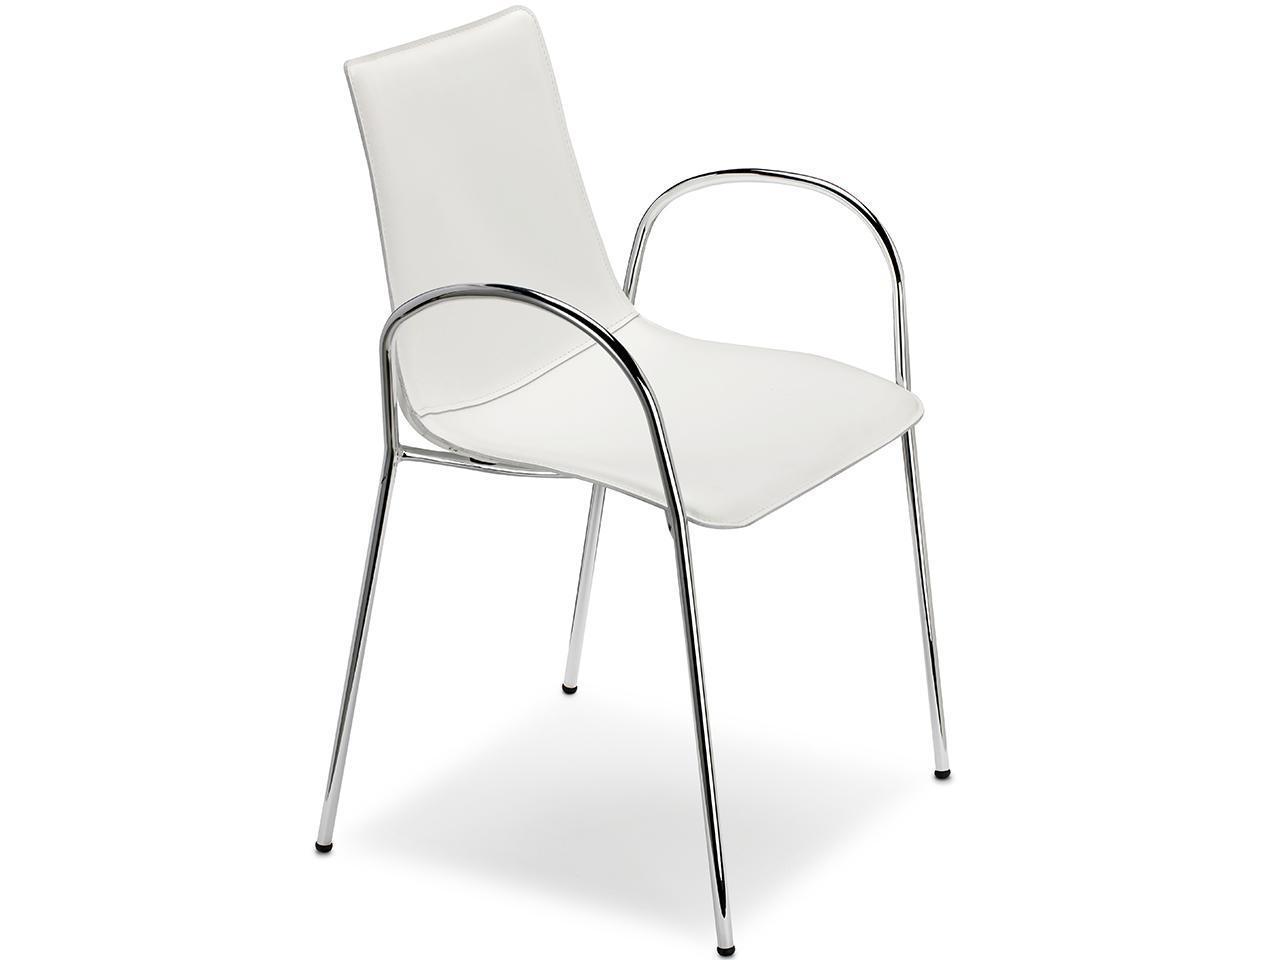 Кресло пластиковое с обивкой Zebra Pop armchair with underseat shell for stacking